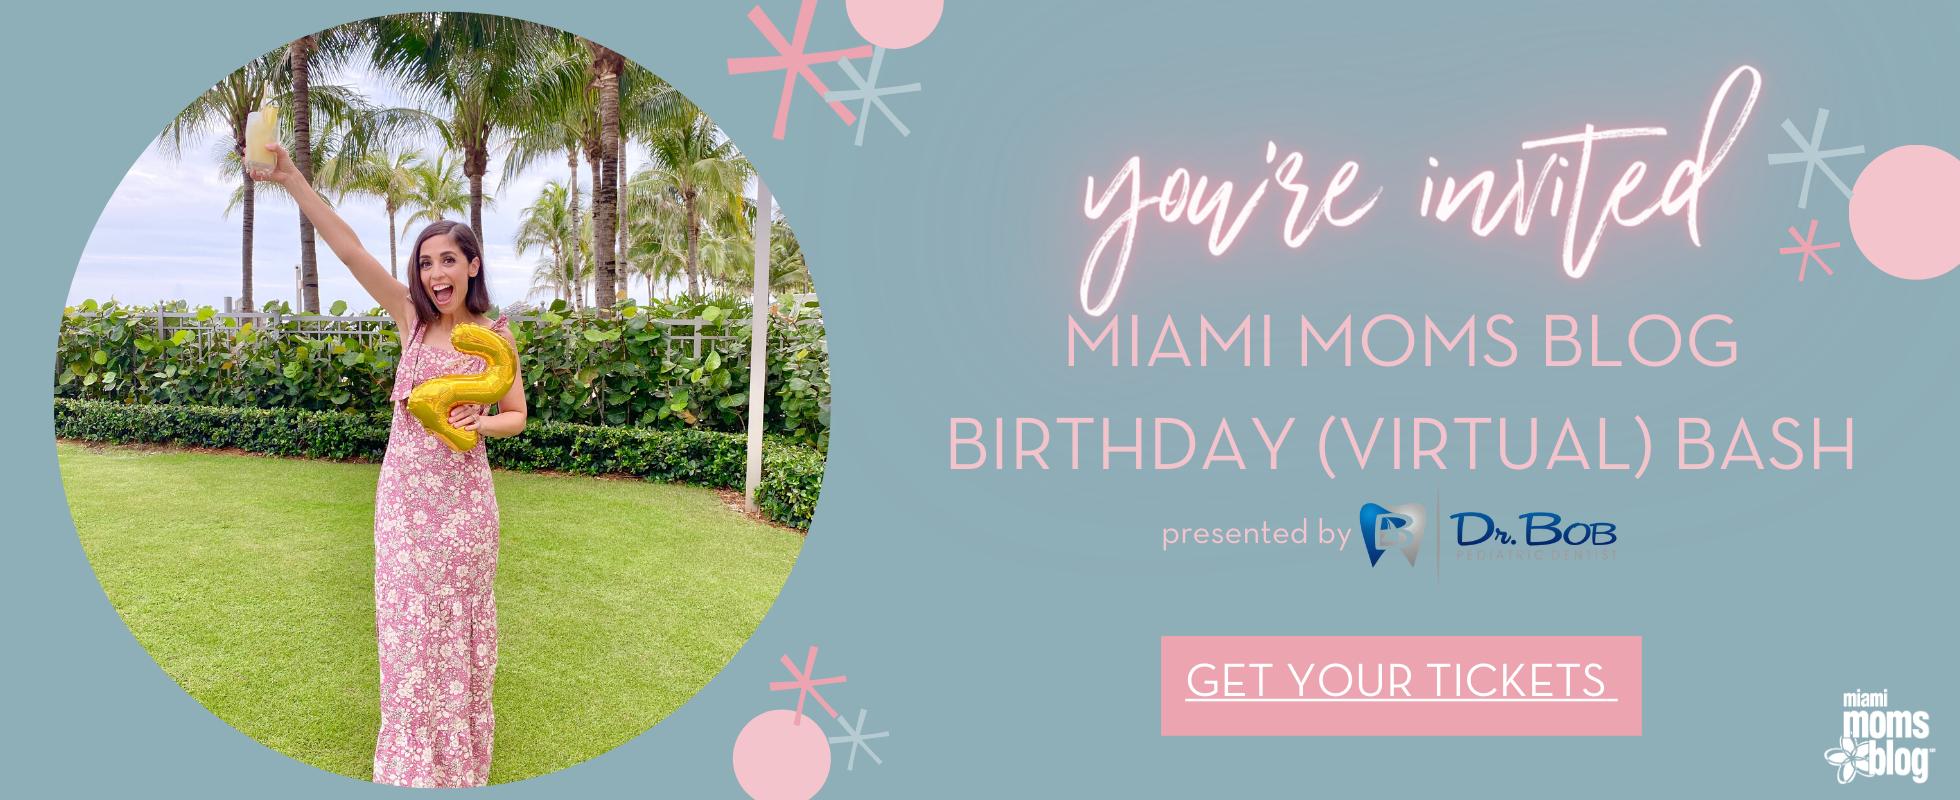 miami moms blog birthday bash